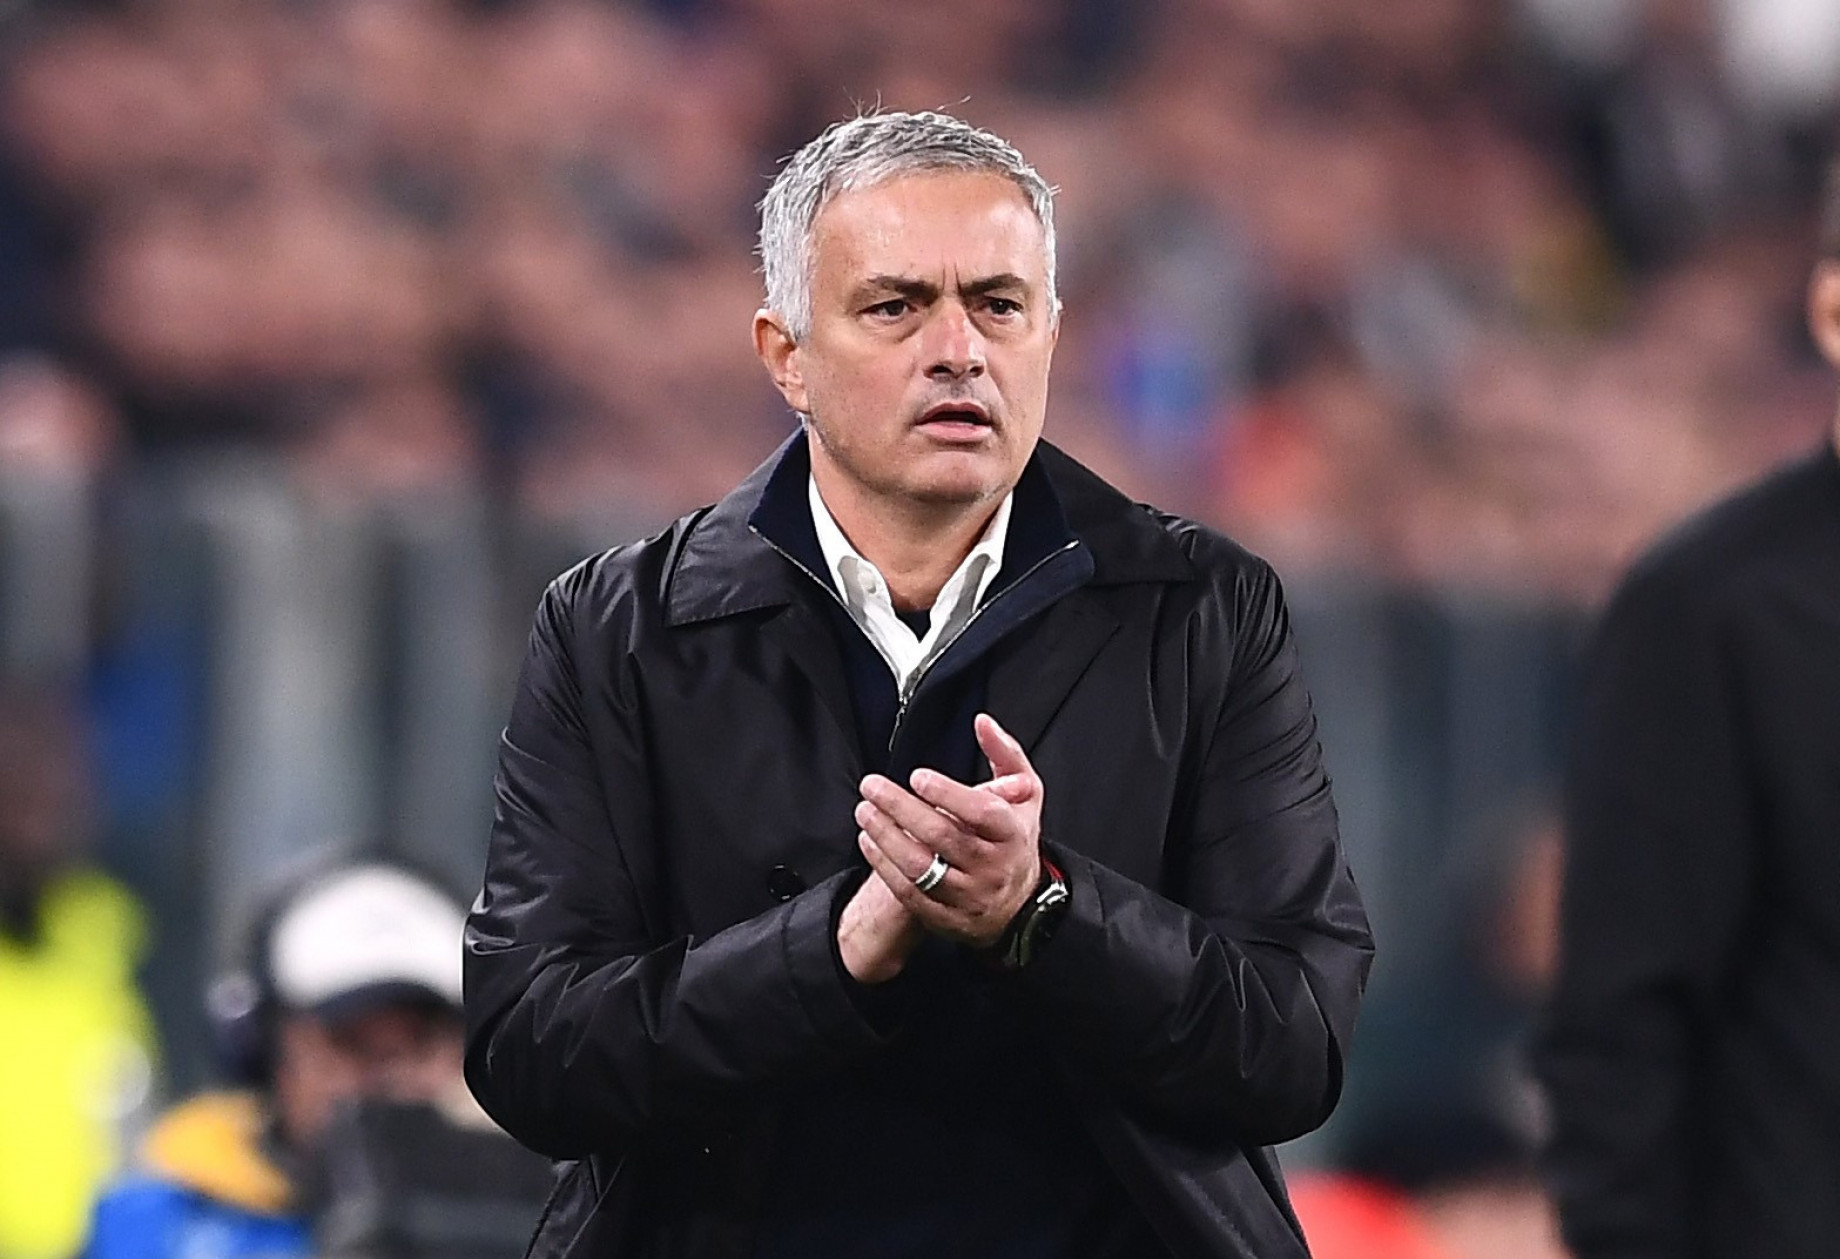 mourinho-image-1.jpg